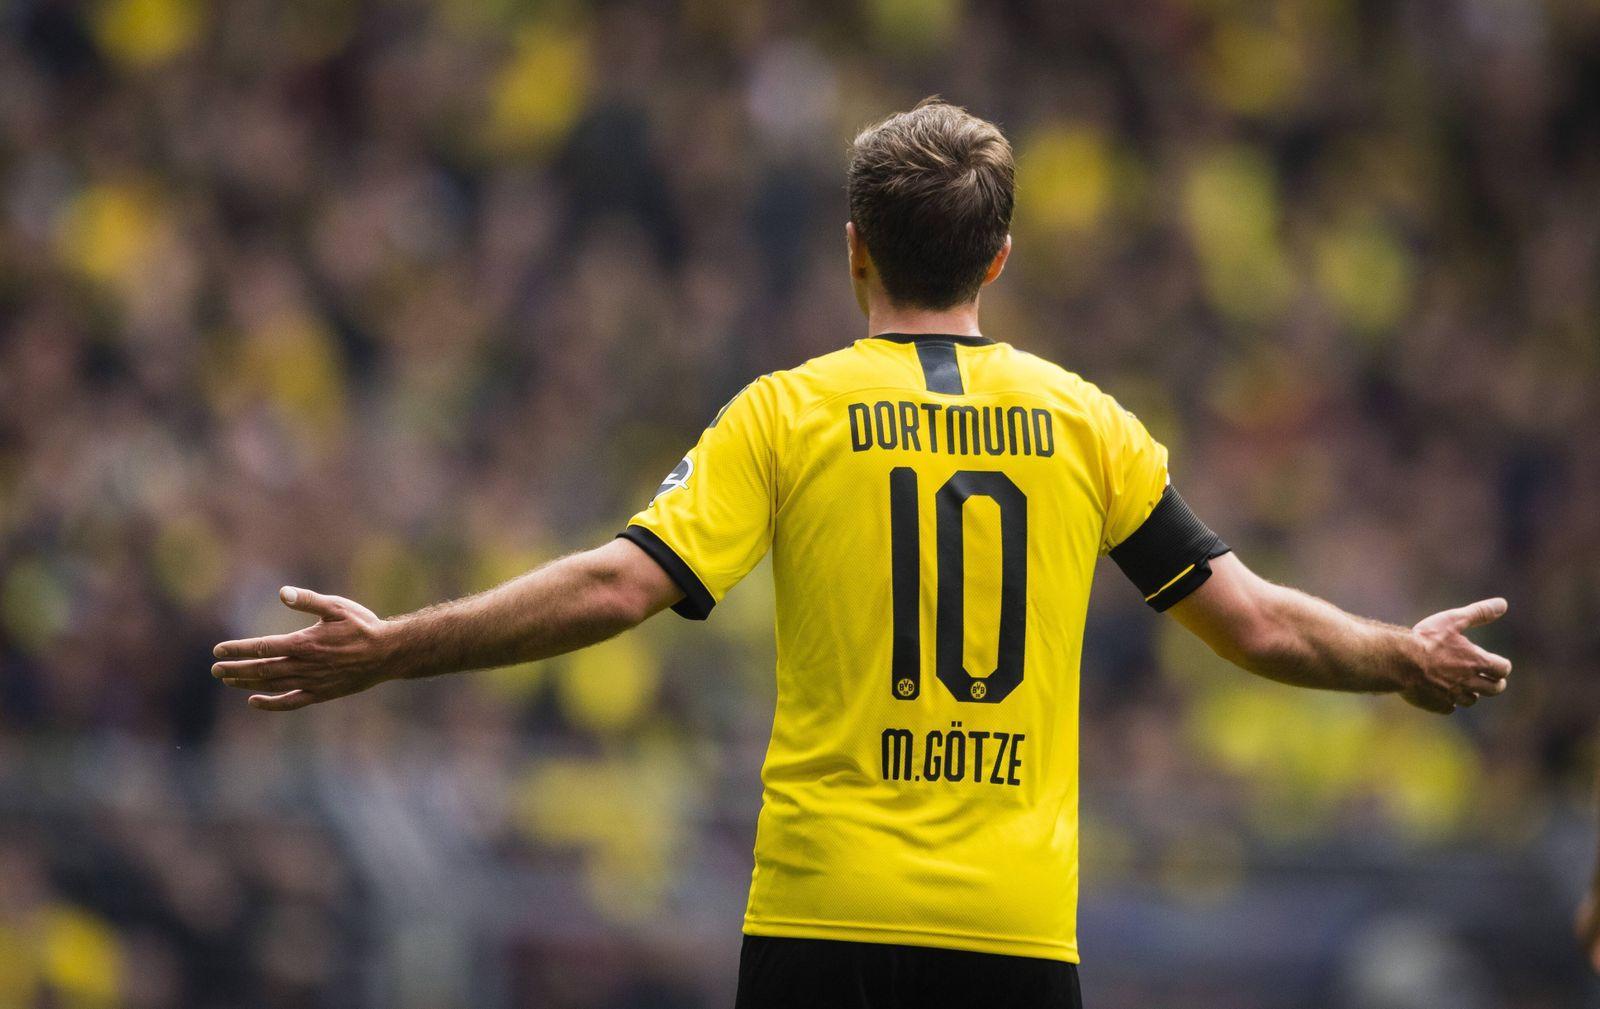 Dortmund, 11.05.2019 Mario Götze (BvB) Borussia Dortmund - Fortuna Düsseldorf *** Dortmund 11 05 2019 Mario Götze BvB B